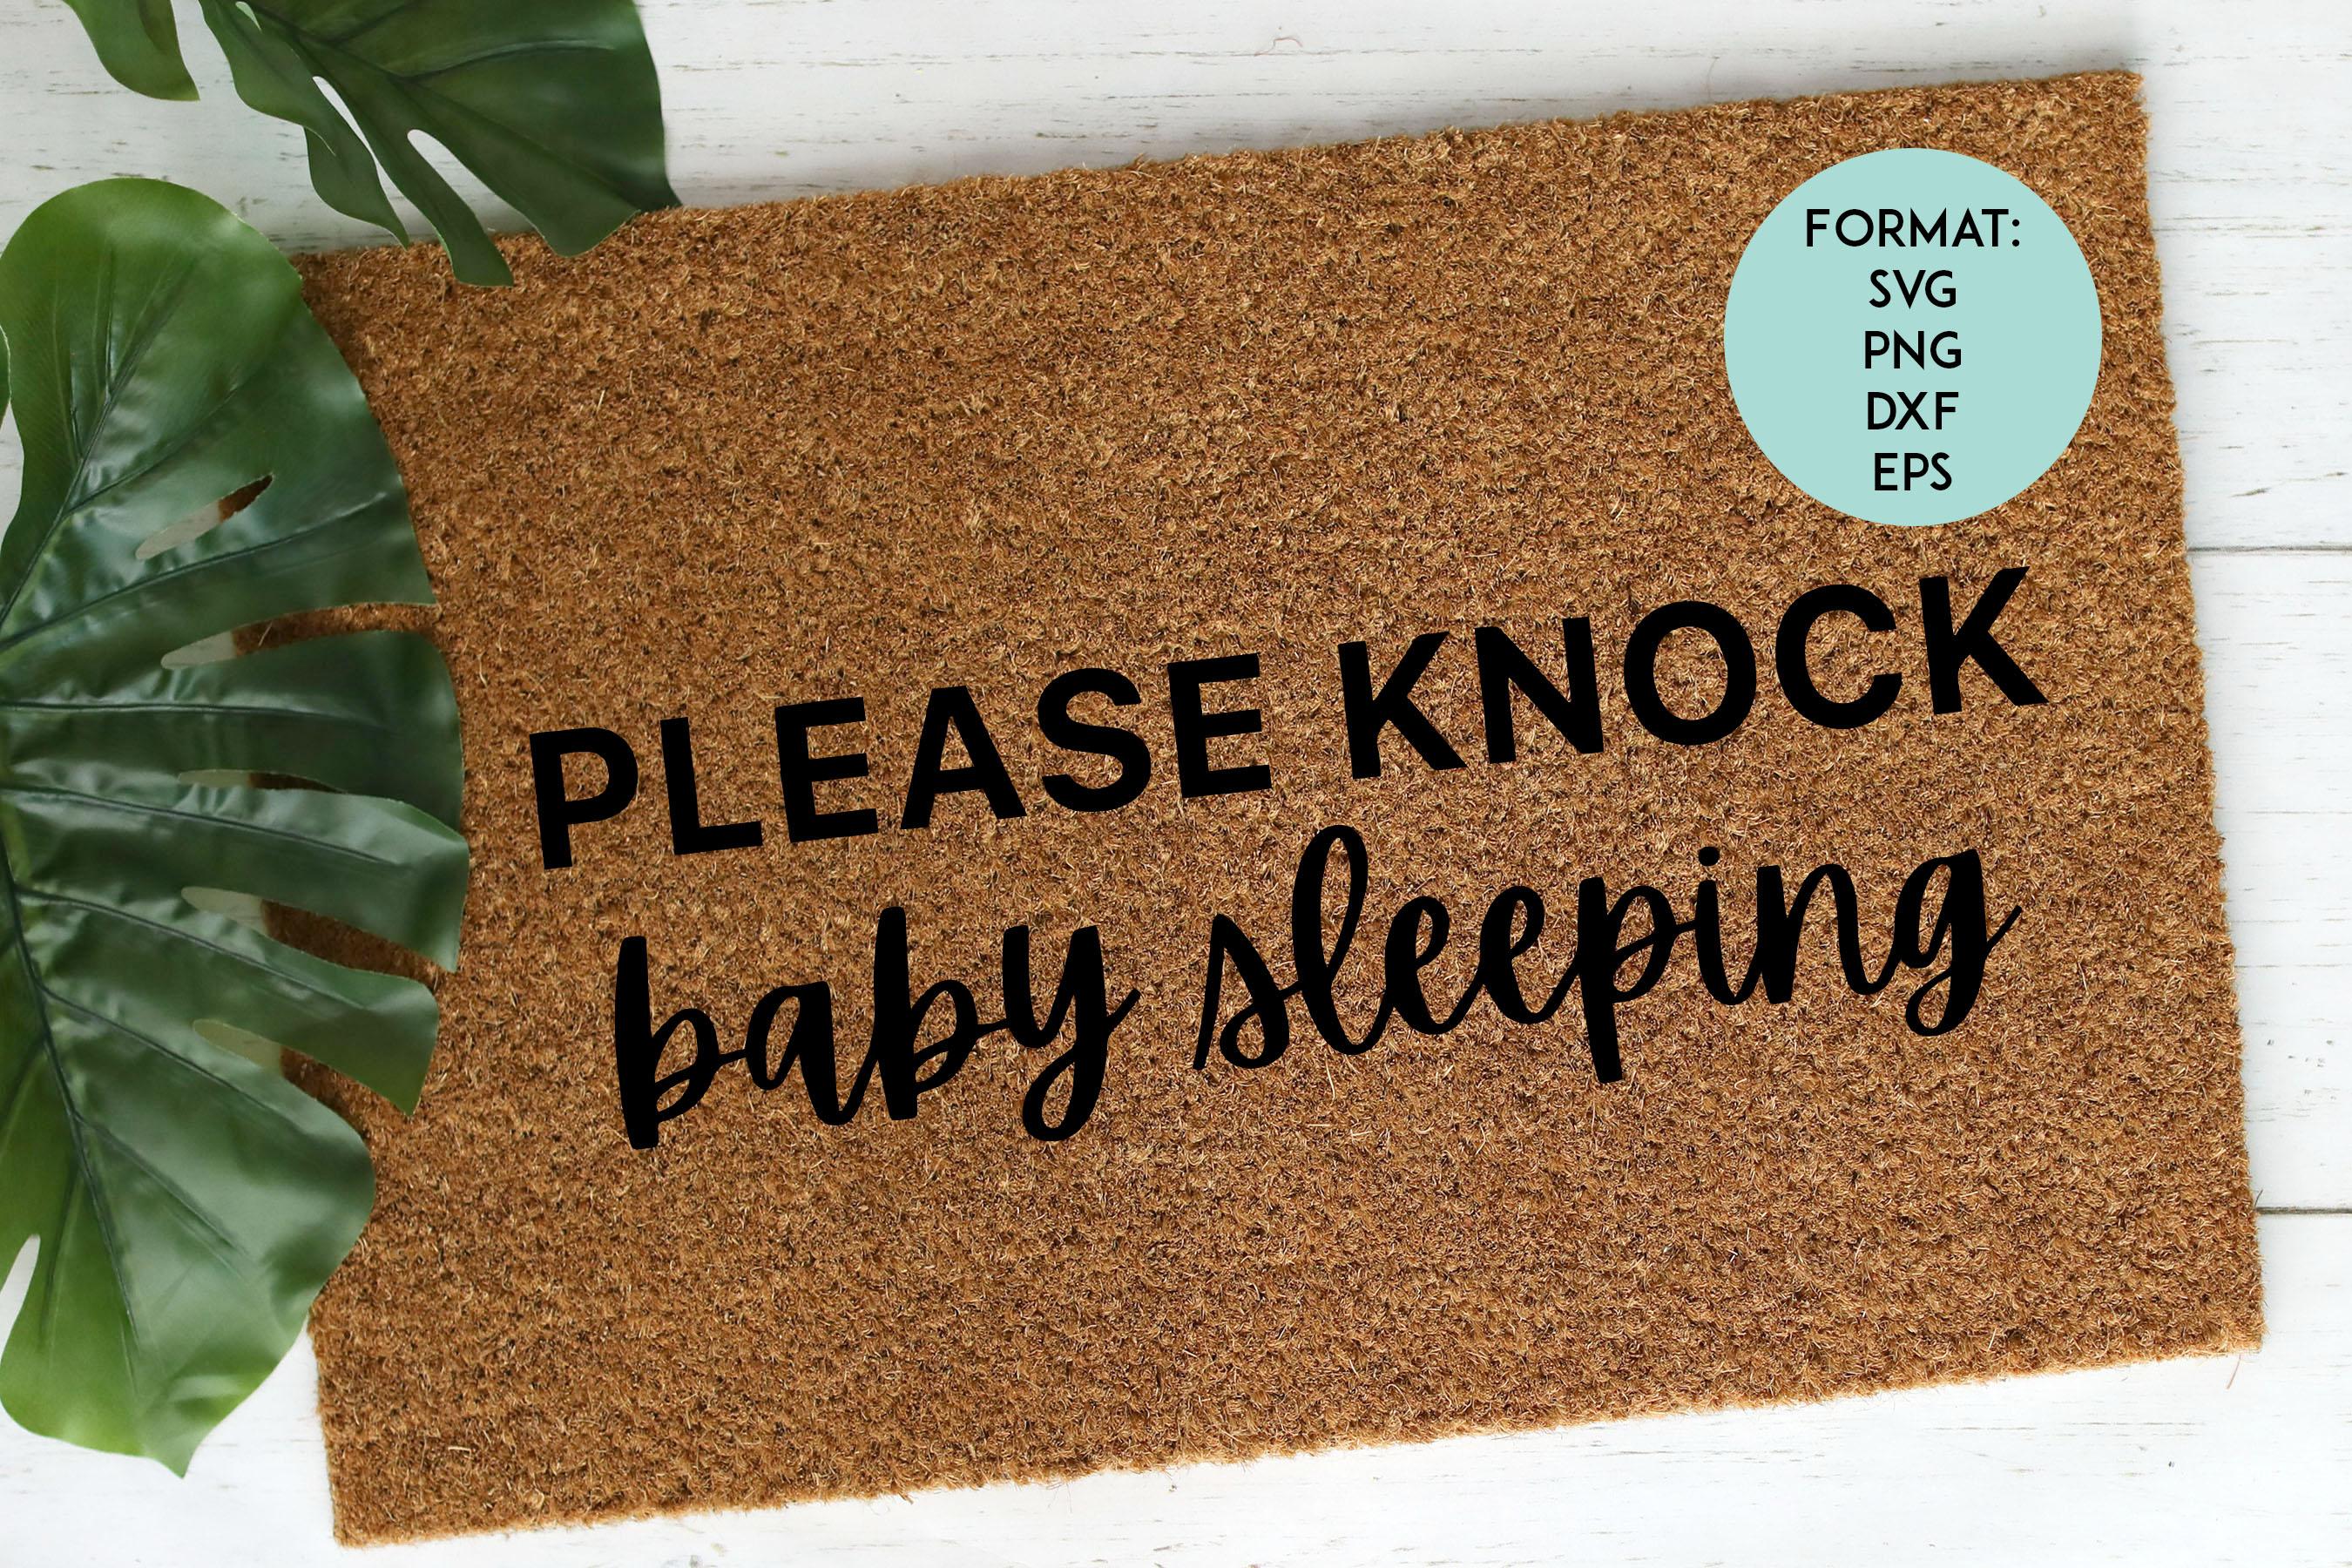 Doormat / Please Knock Baby Sleeping / Funny SVG File example image 1